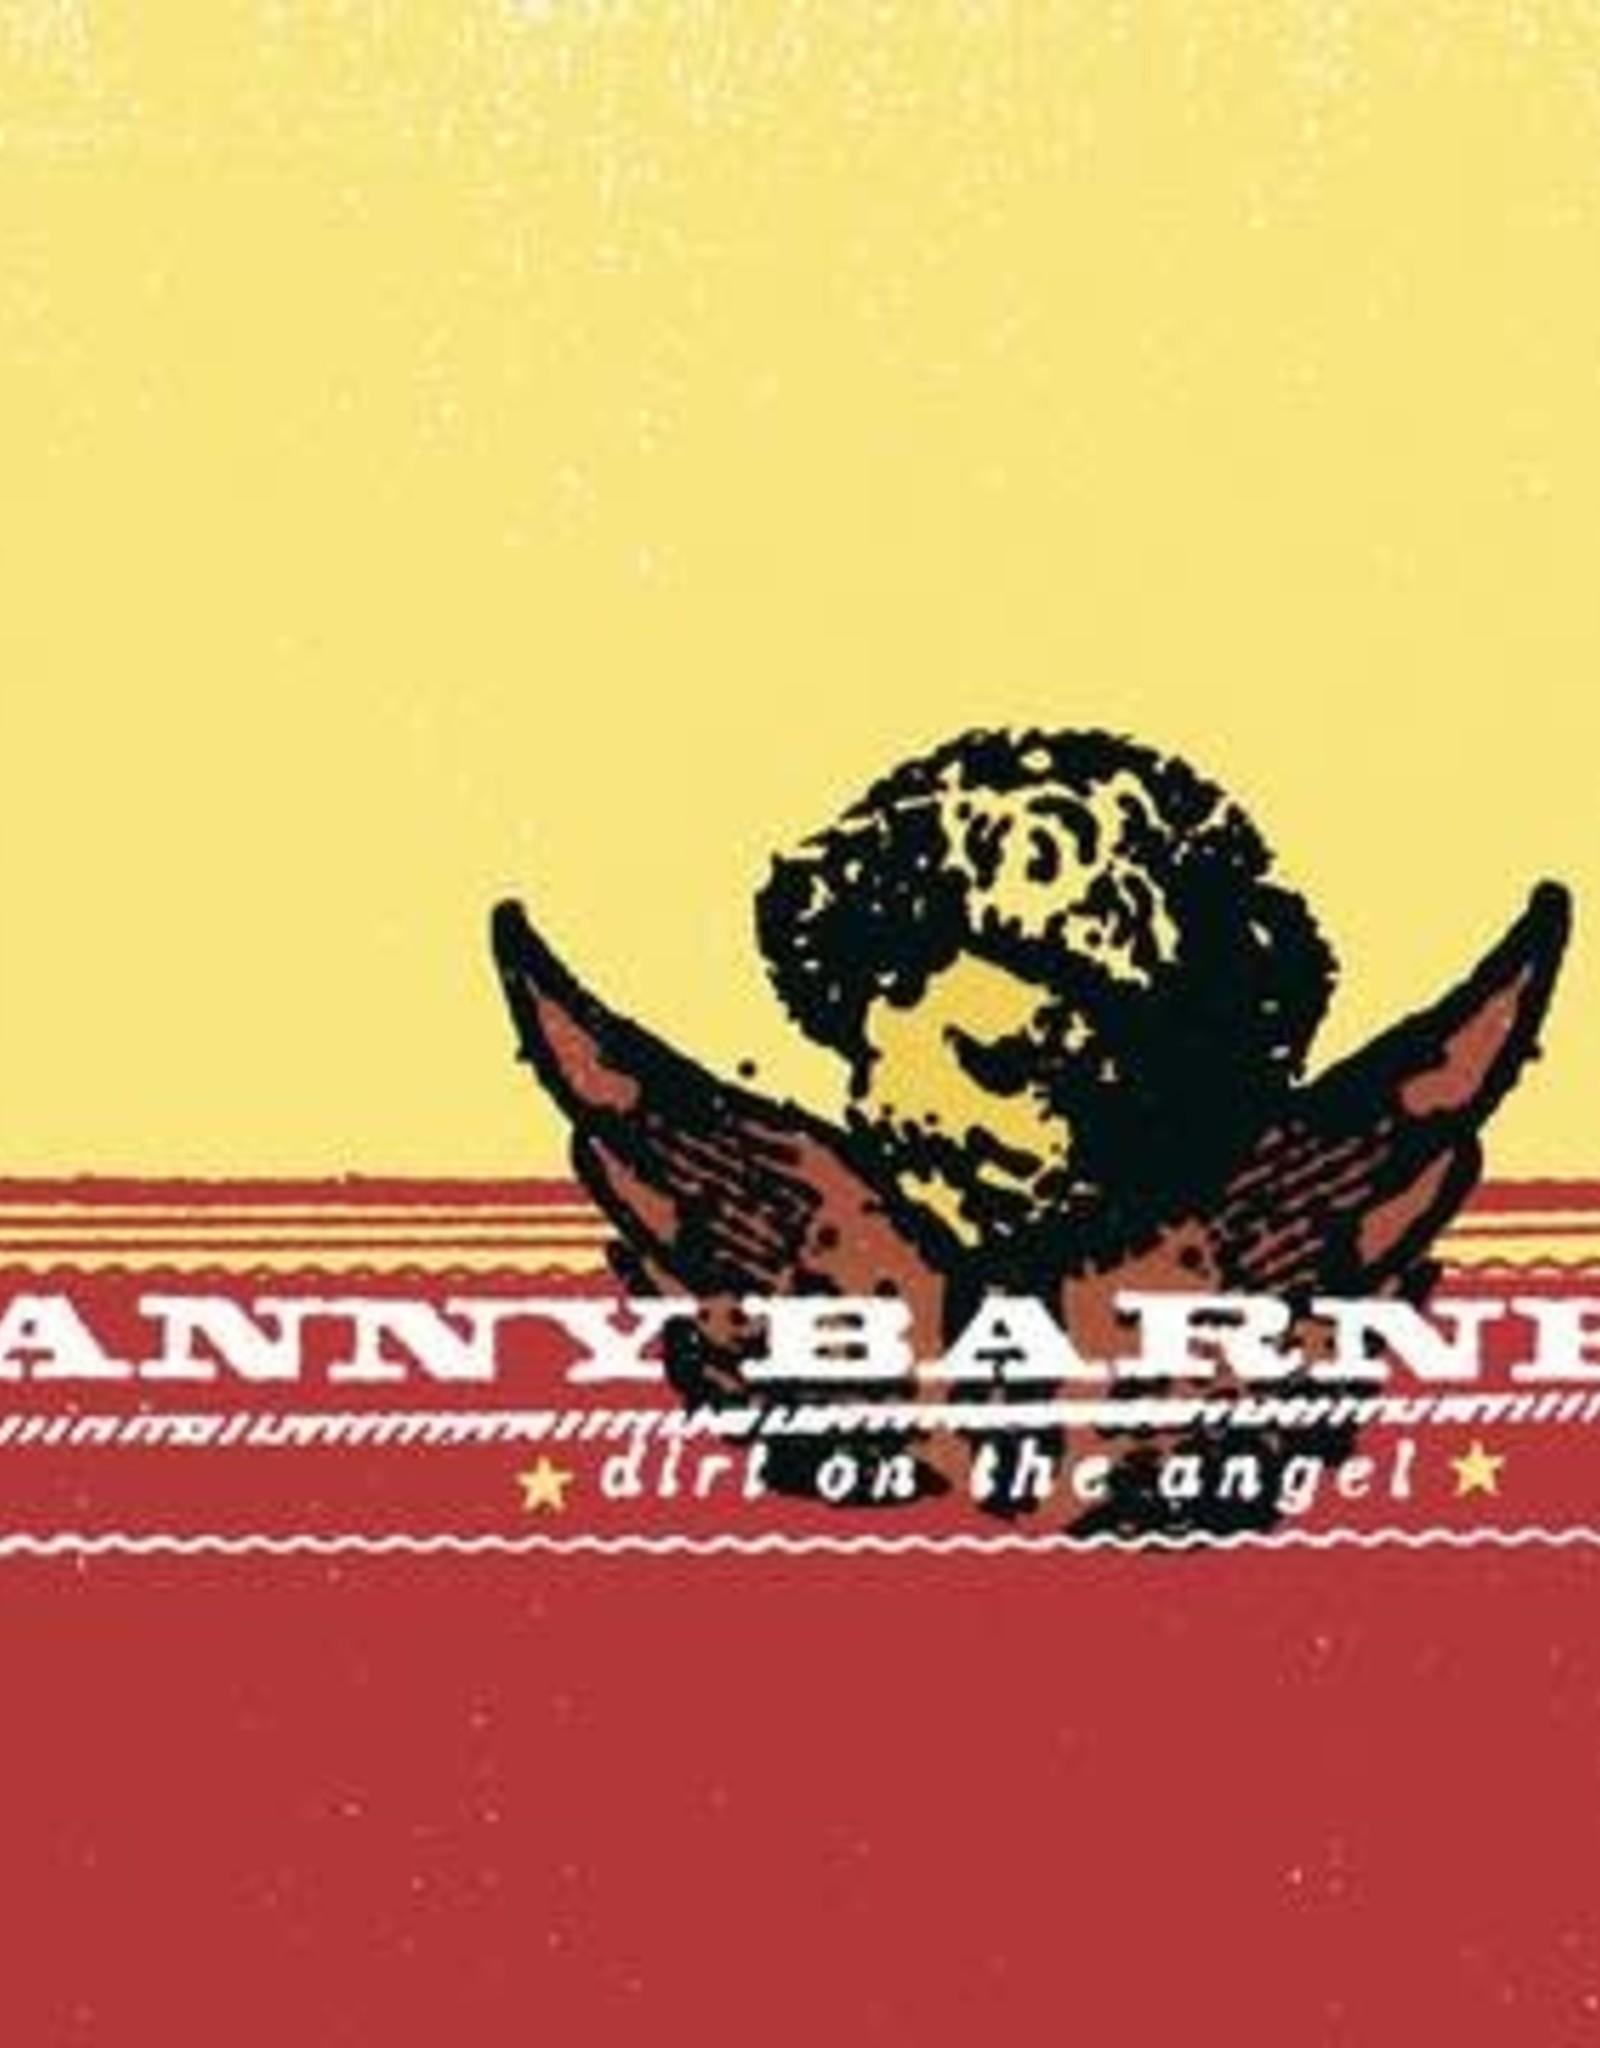 Danny Barnes - Dirt On The Angel (RSD 6/21)